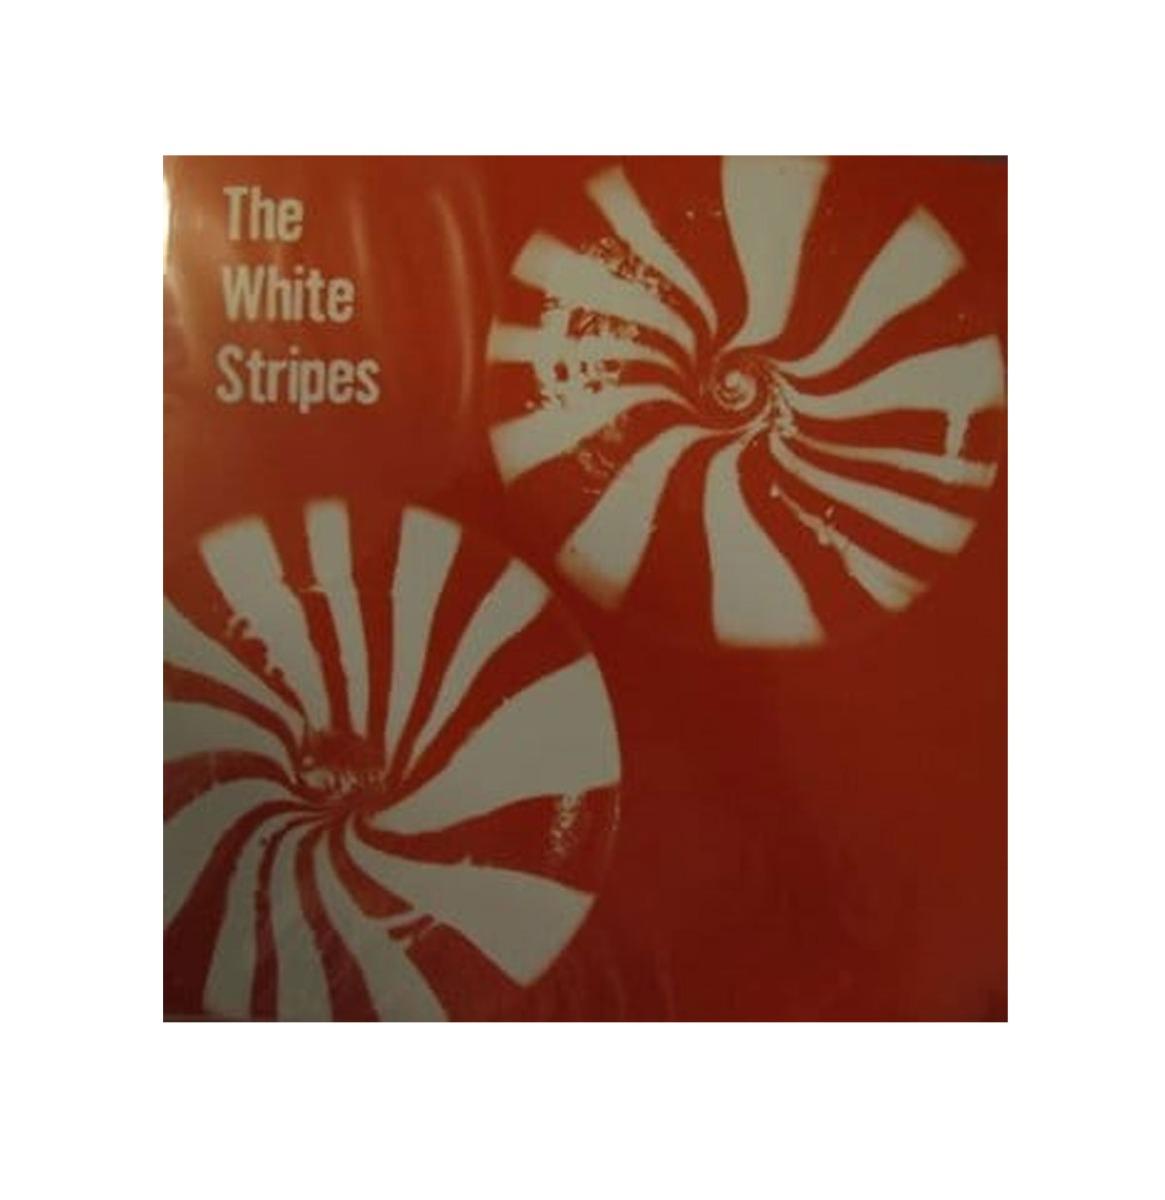 Single: The White Stripes - Lafayette Blues / Sugar Never Tasted So Good